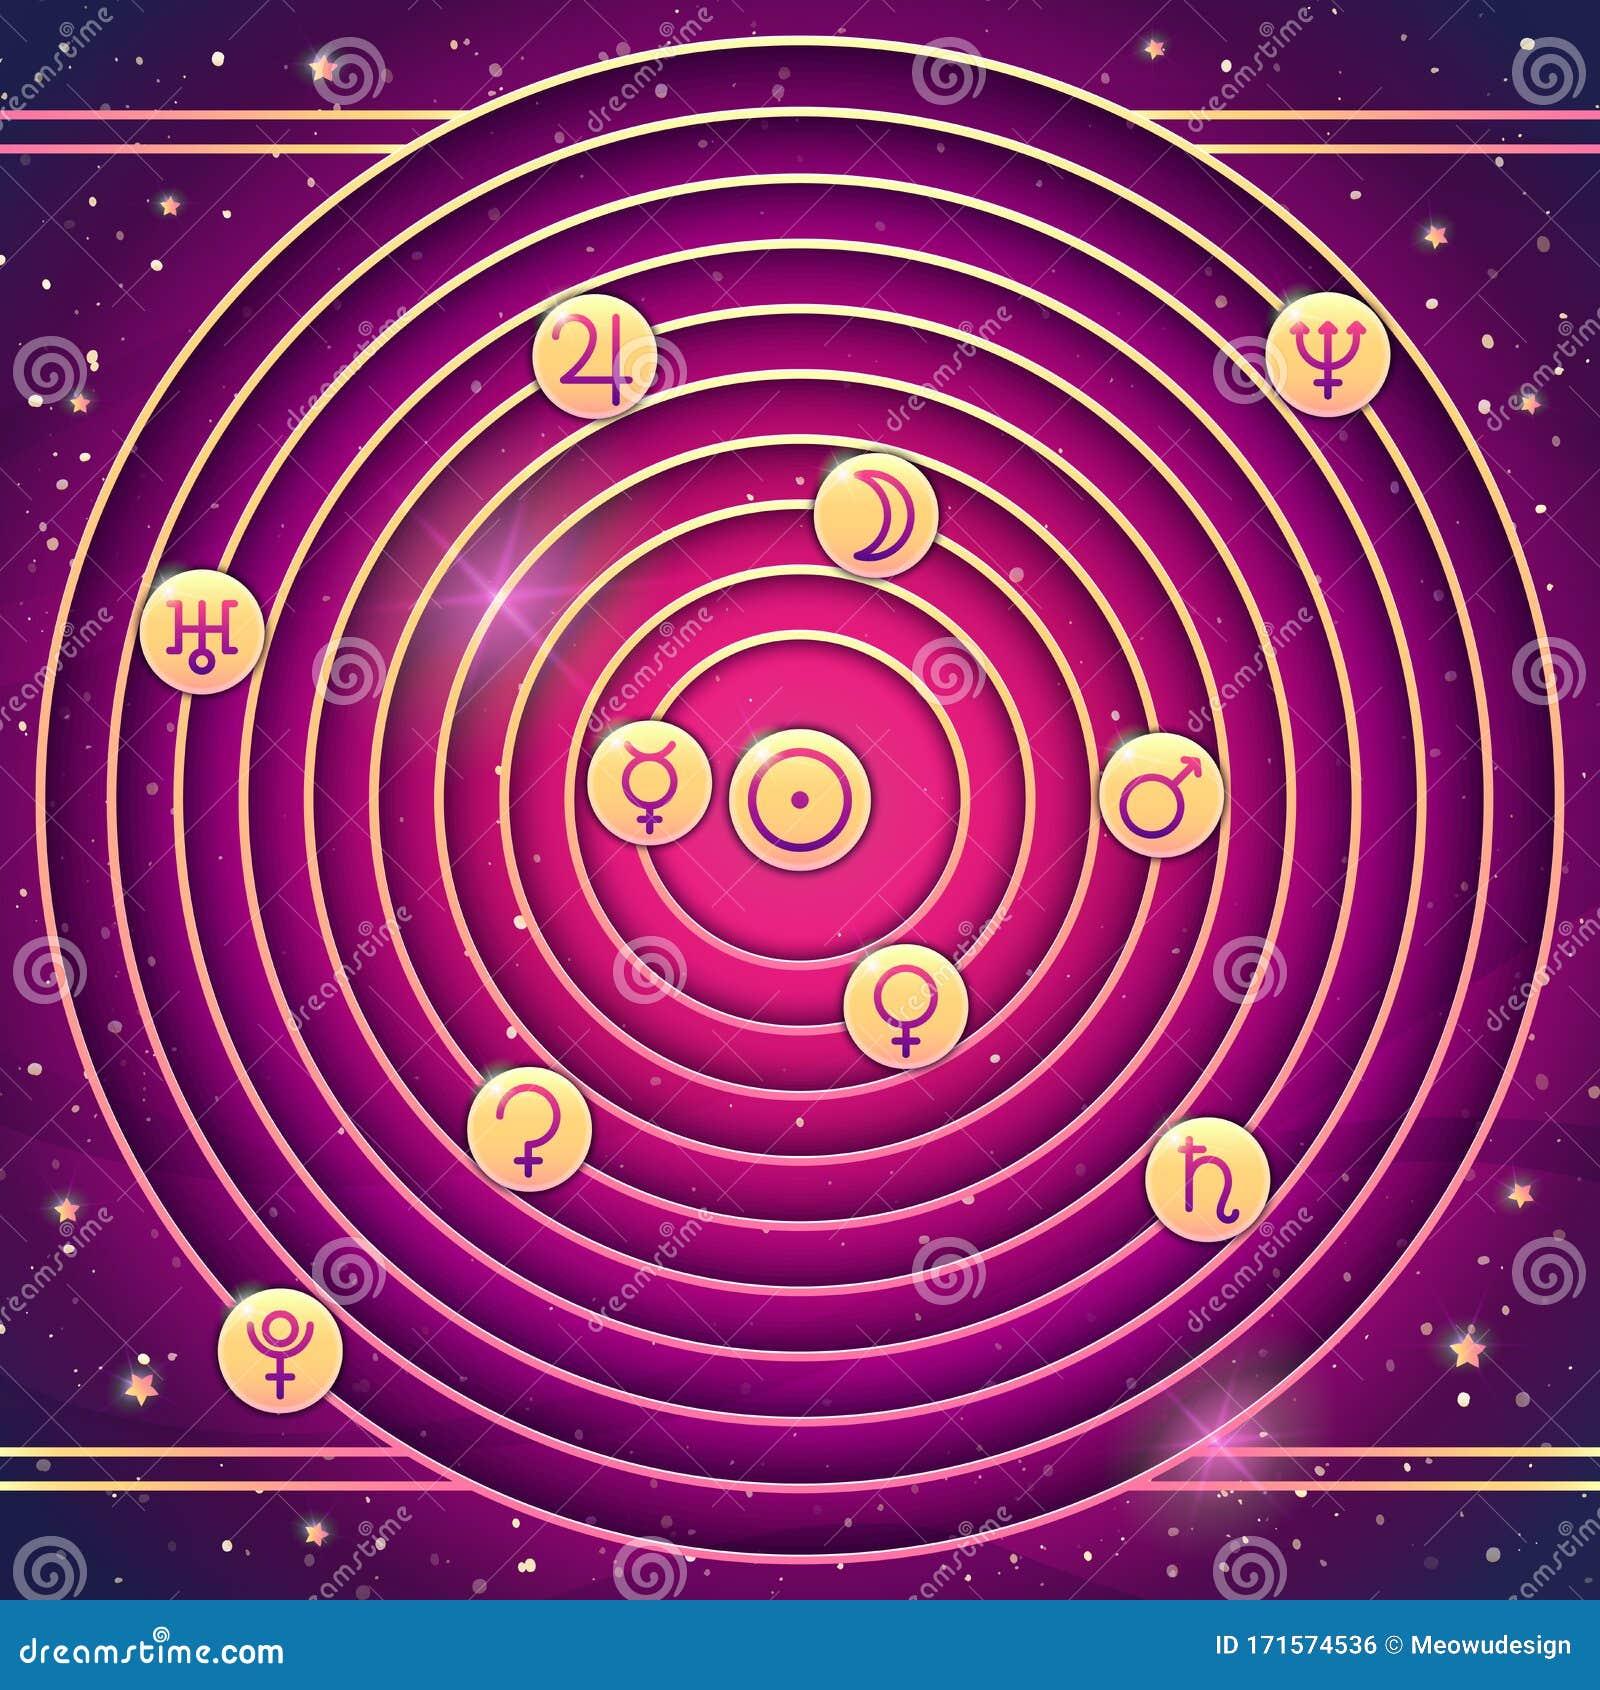 Zodiac Symbols Wheel Banner Astrological Vector Background Stock Vector Illustration Of Oracle Orbit 171574536